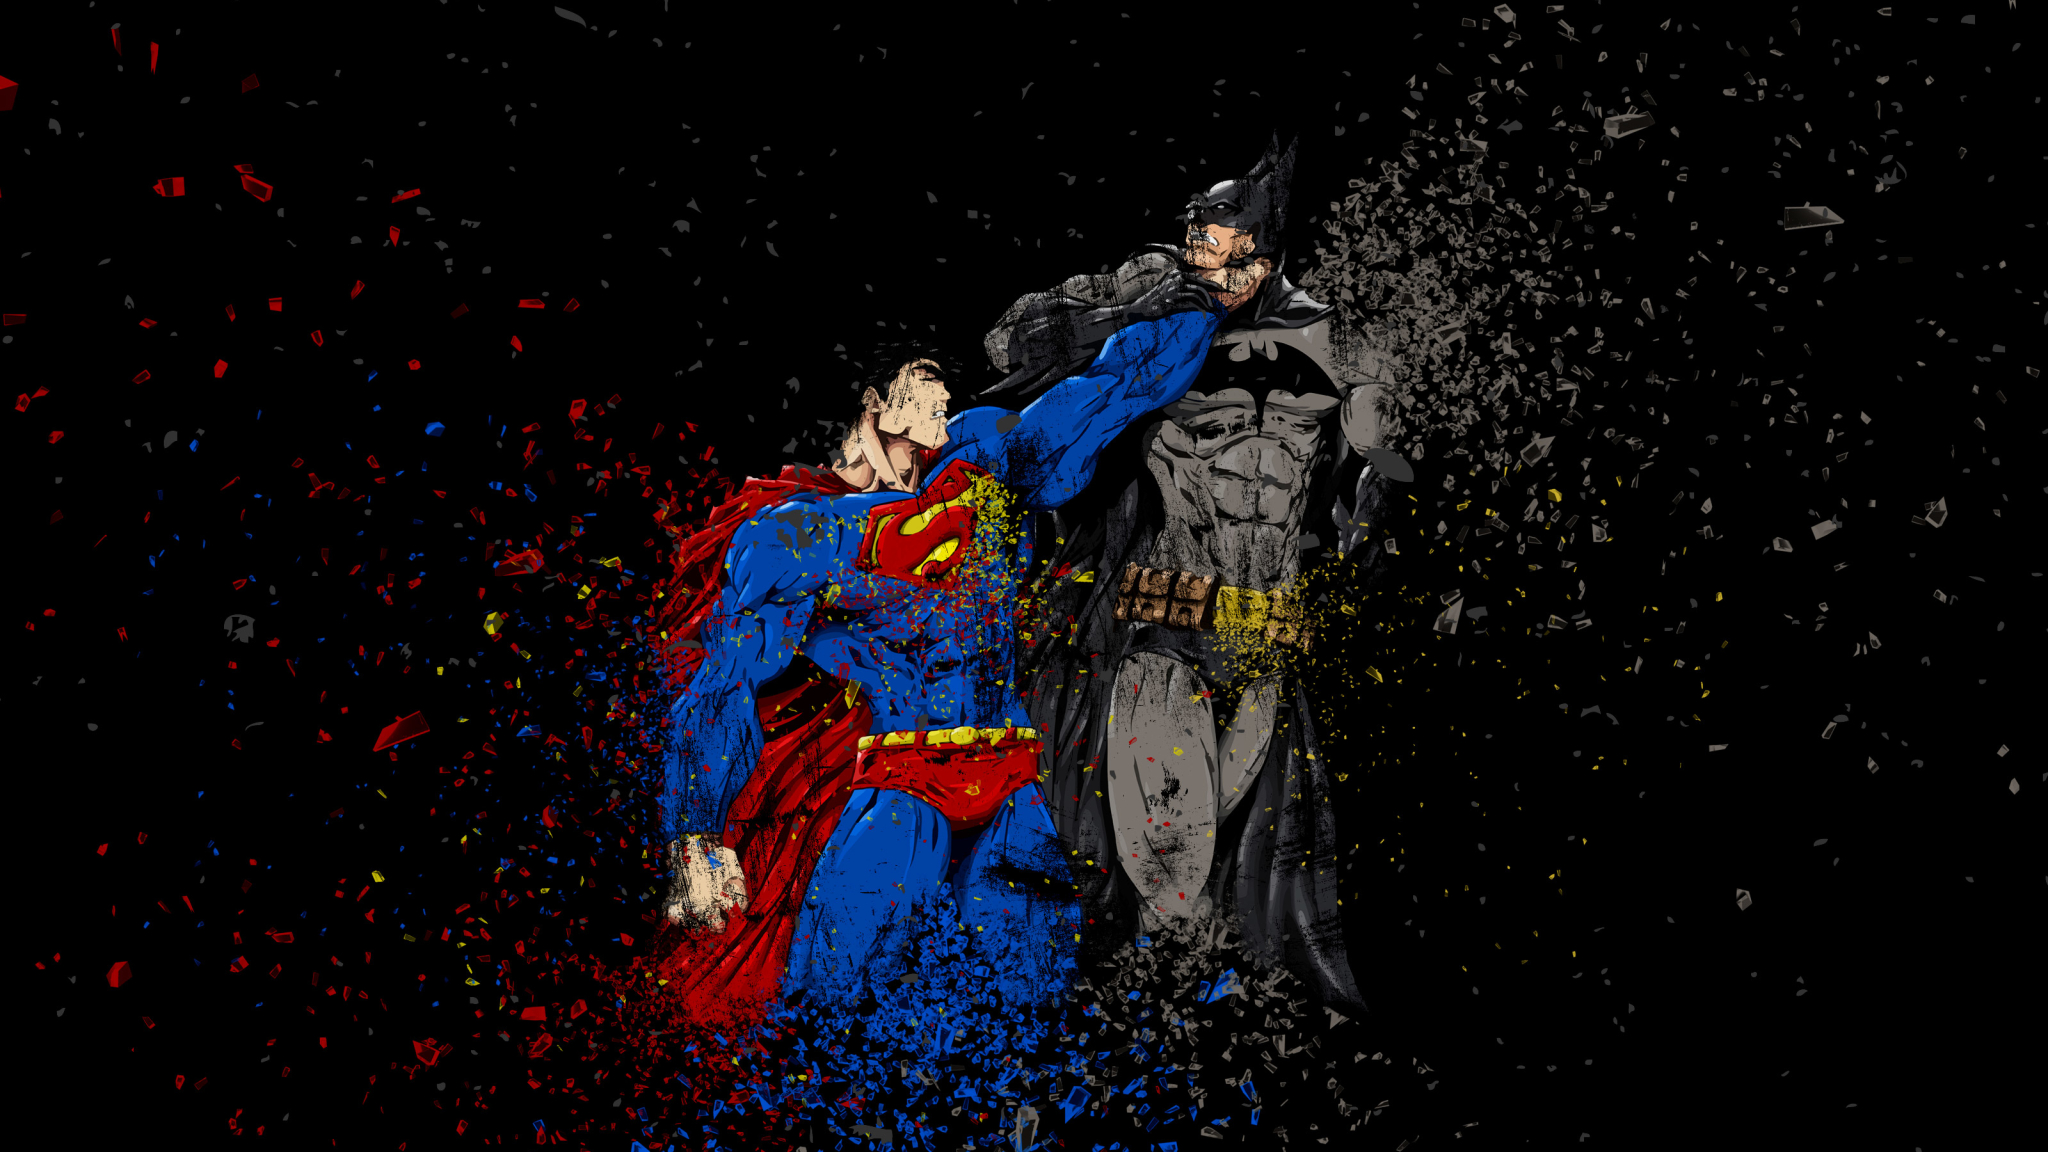 2048x1152 Batman Vs Superman Ruggon Style 2048x1152